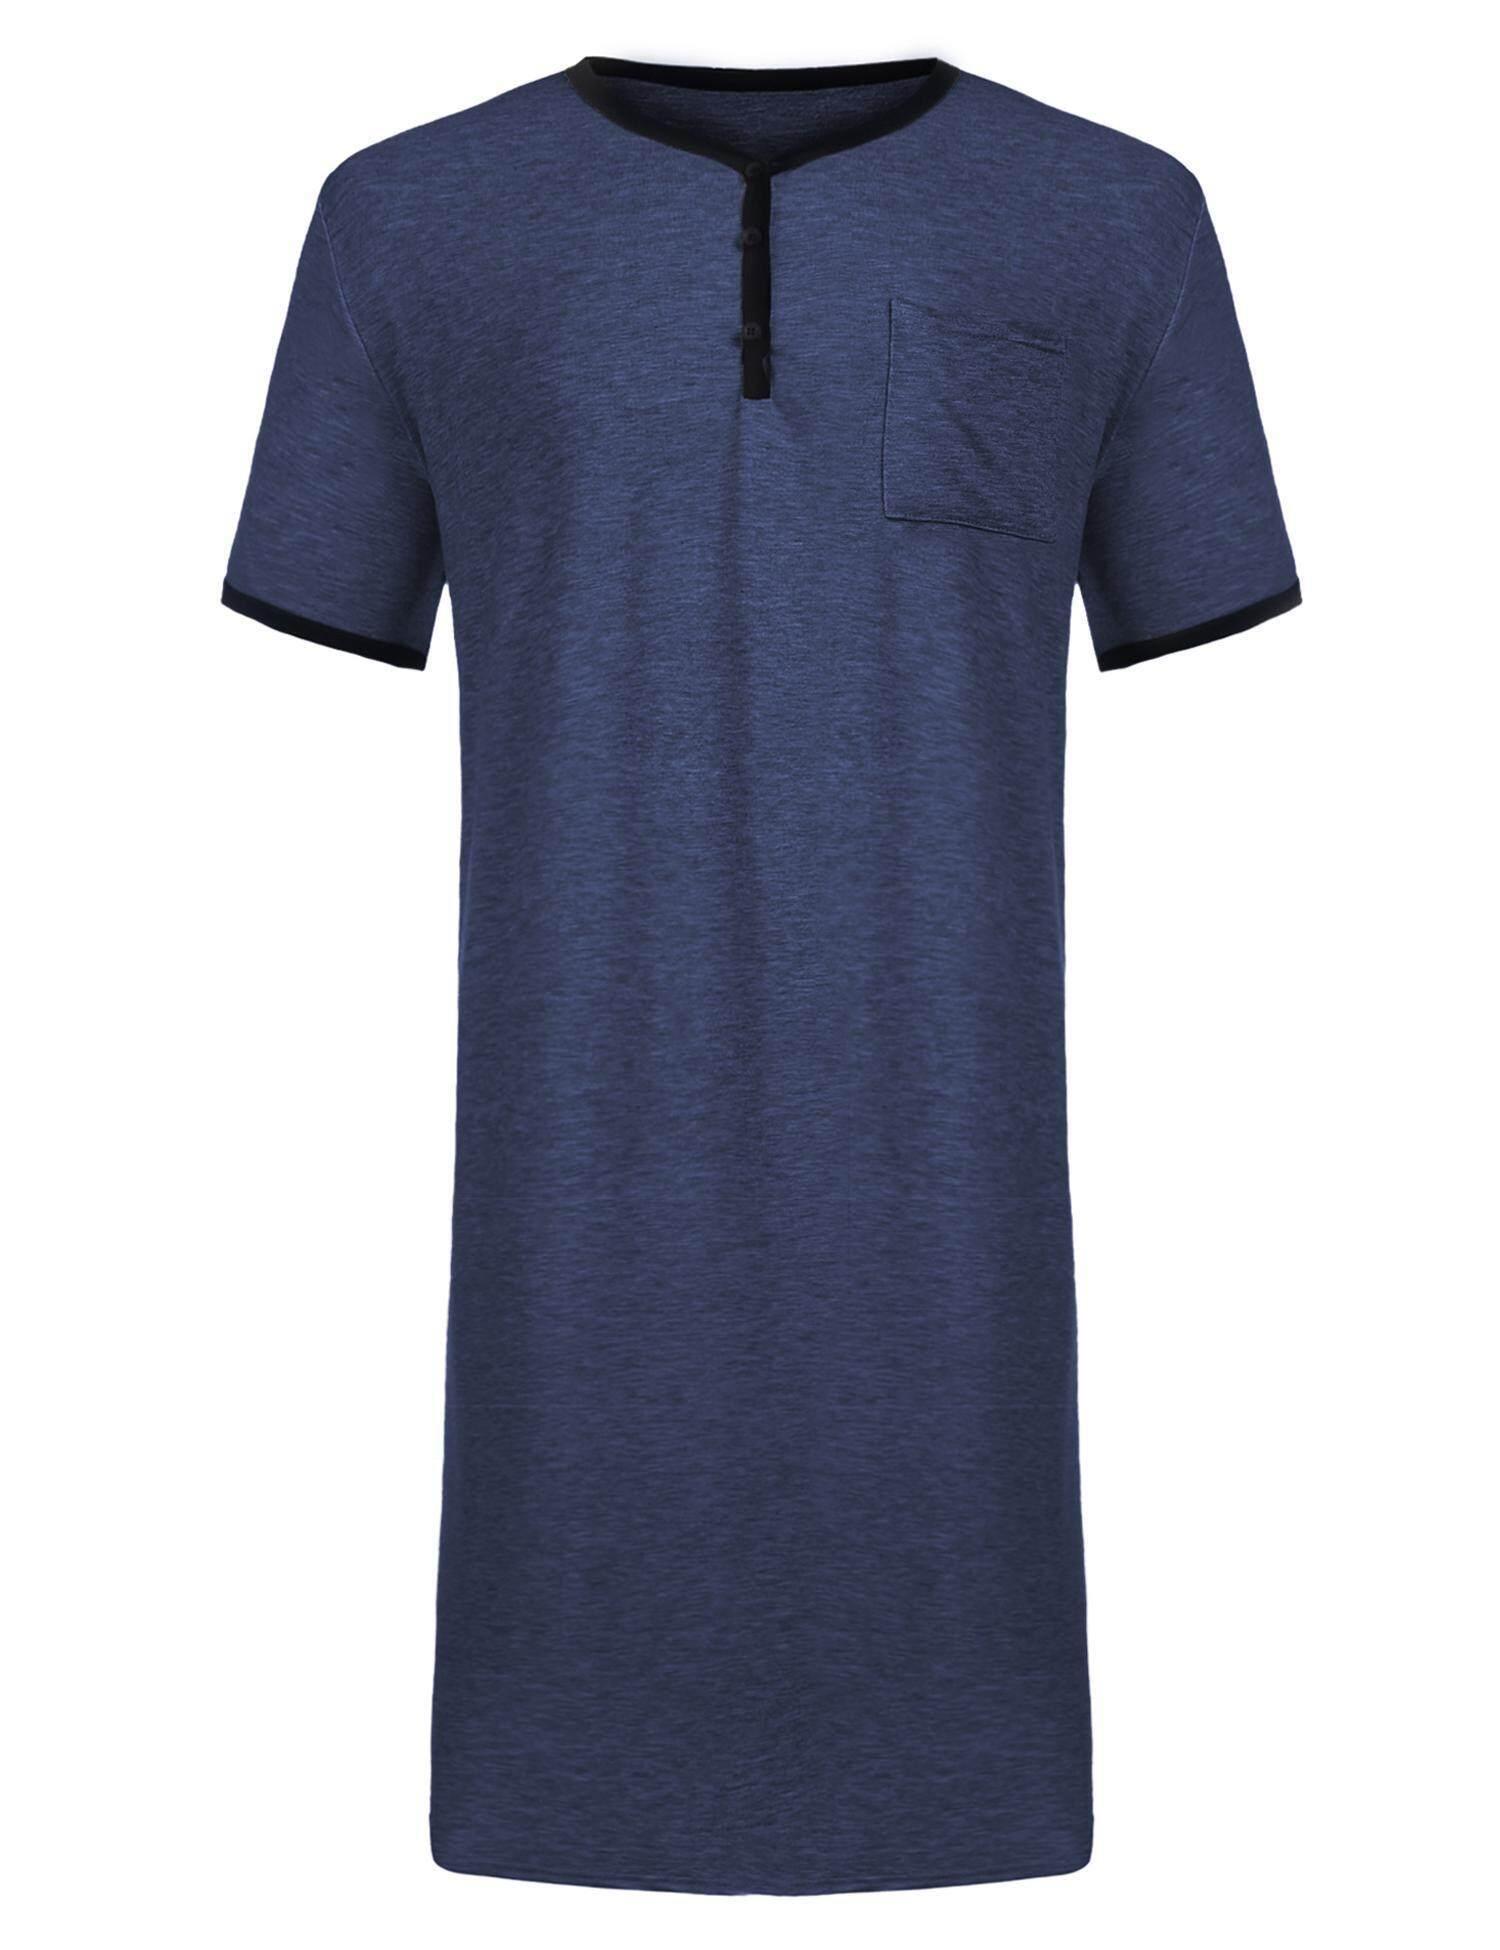 High Quality Sunwonder Men Comfort Short Sleeve Nightshirt Nightgown Big Tall Sleep Shirt Nightwear(black) - Intl By Sunwonder.